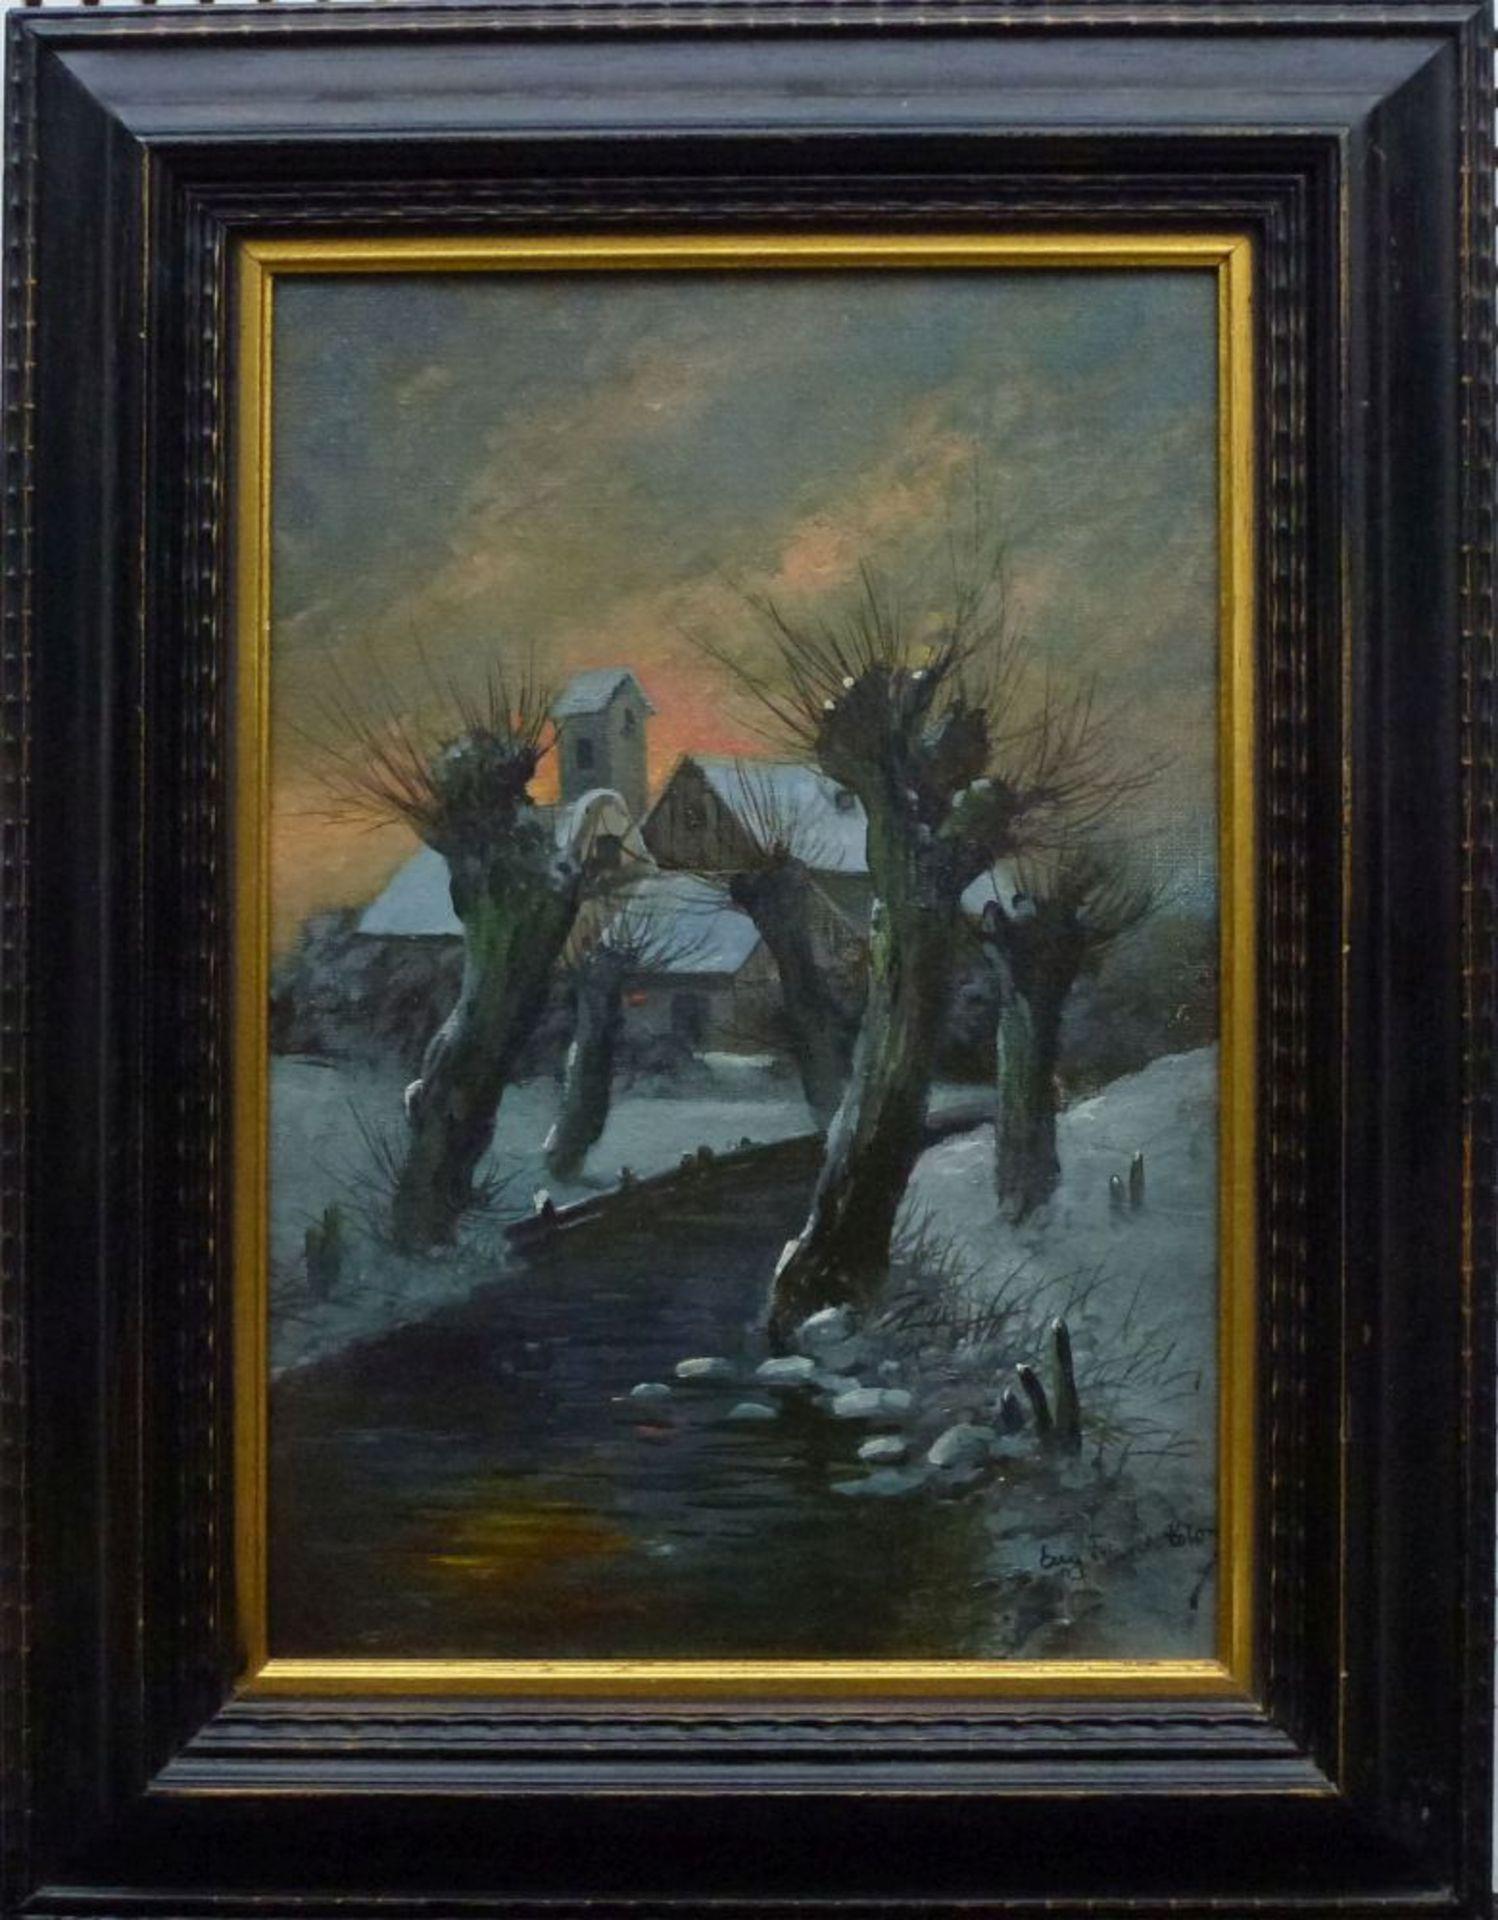 Winter, Eugen Frank-ColonÖl/Lw, sign., Weg zw. Kopfweiden, Hof im HG, R, 36x26cm - Bild 2 aus 3